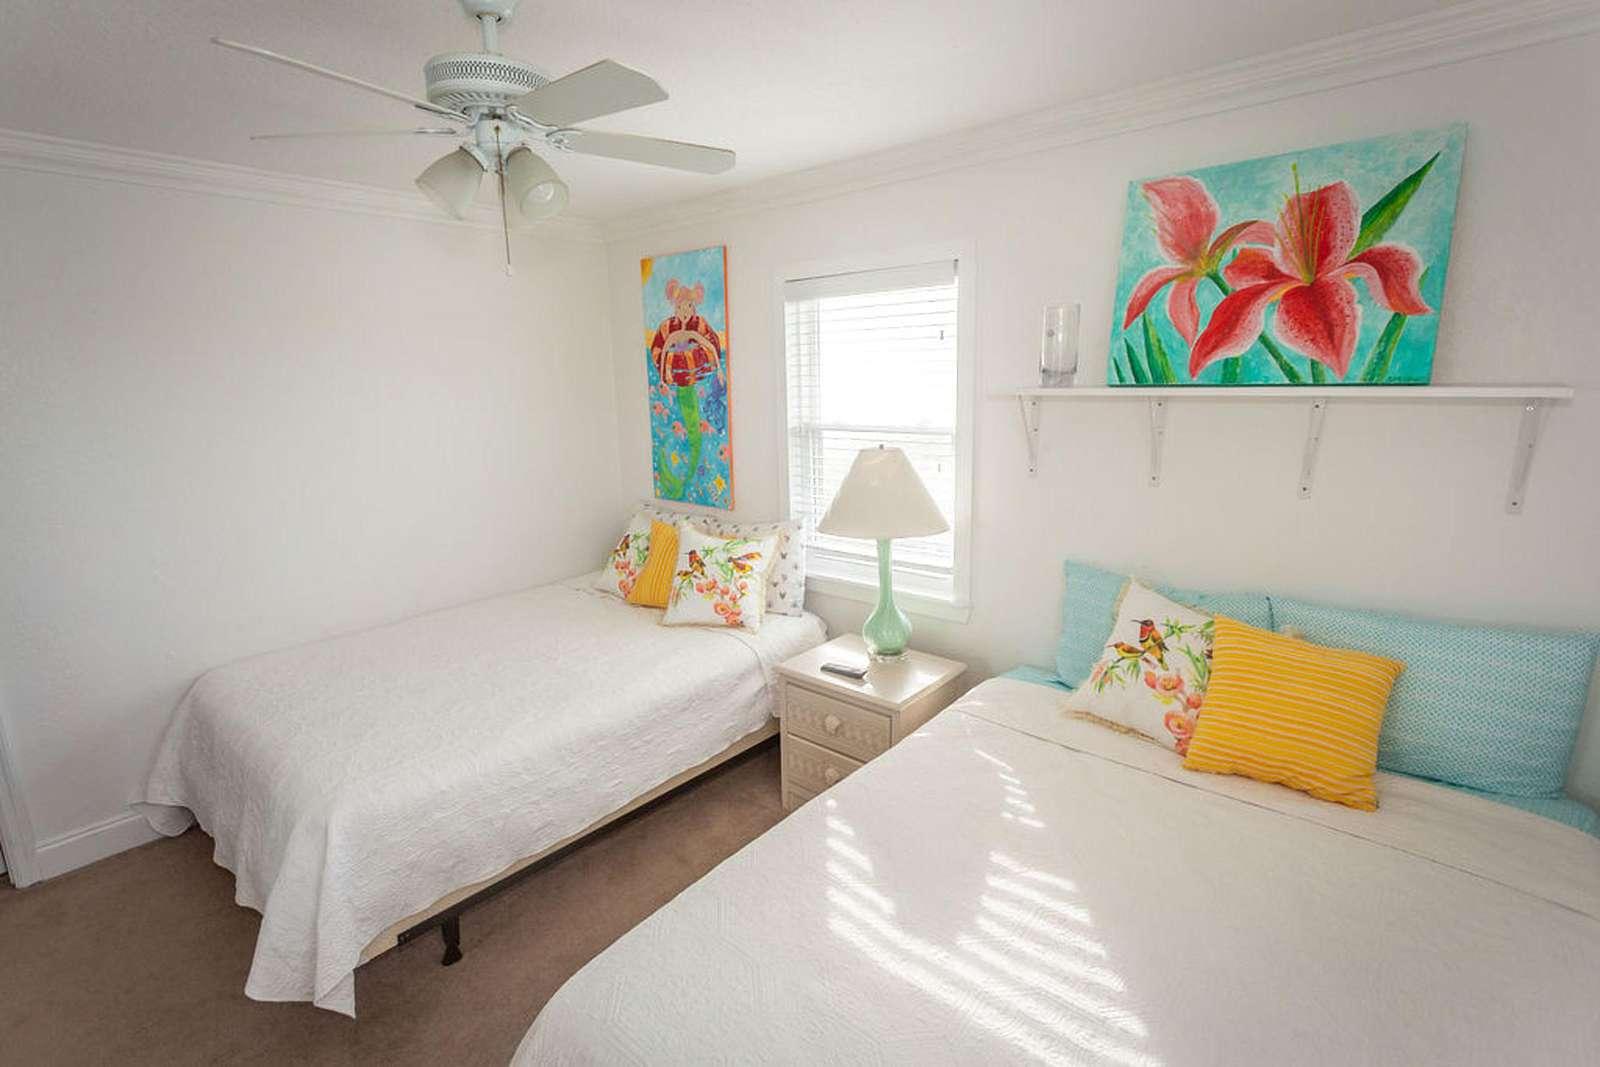 Br # 3 has two queen beds, flat screen, ceiling fan